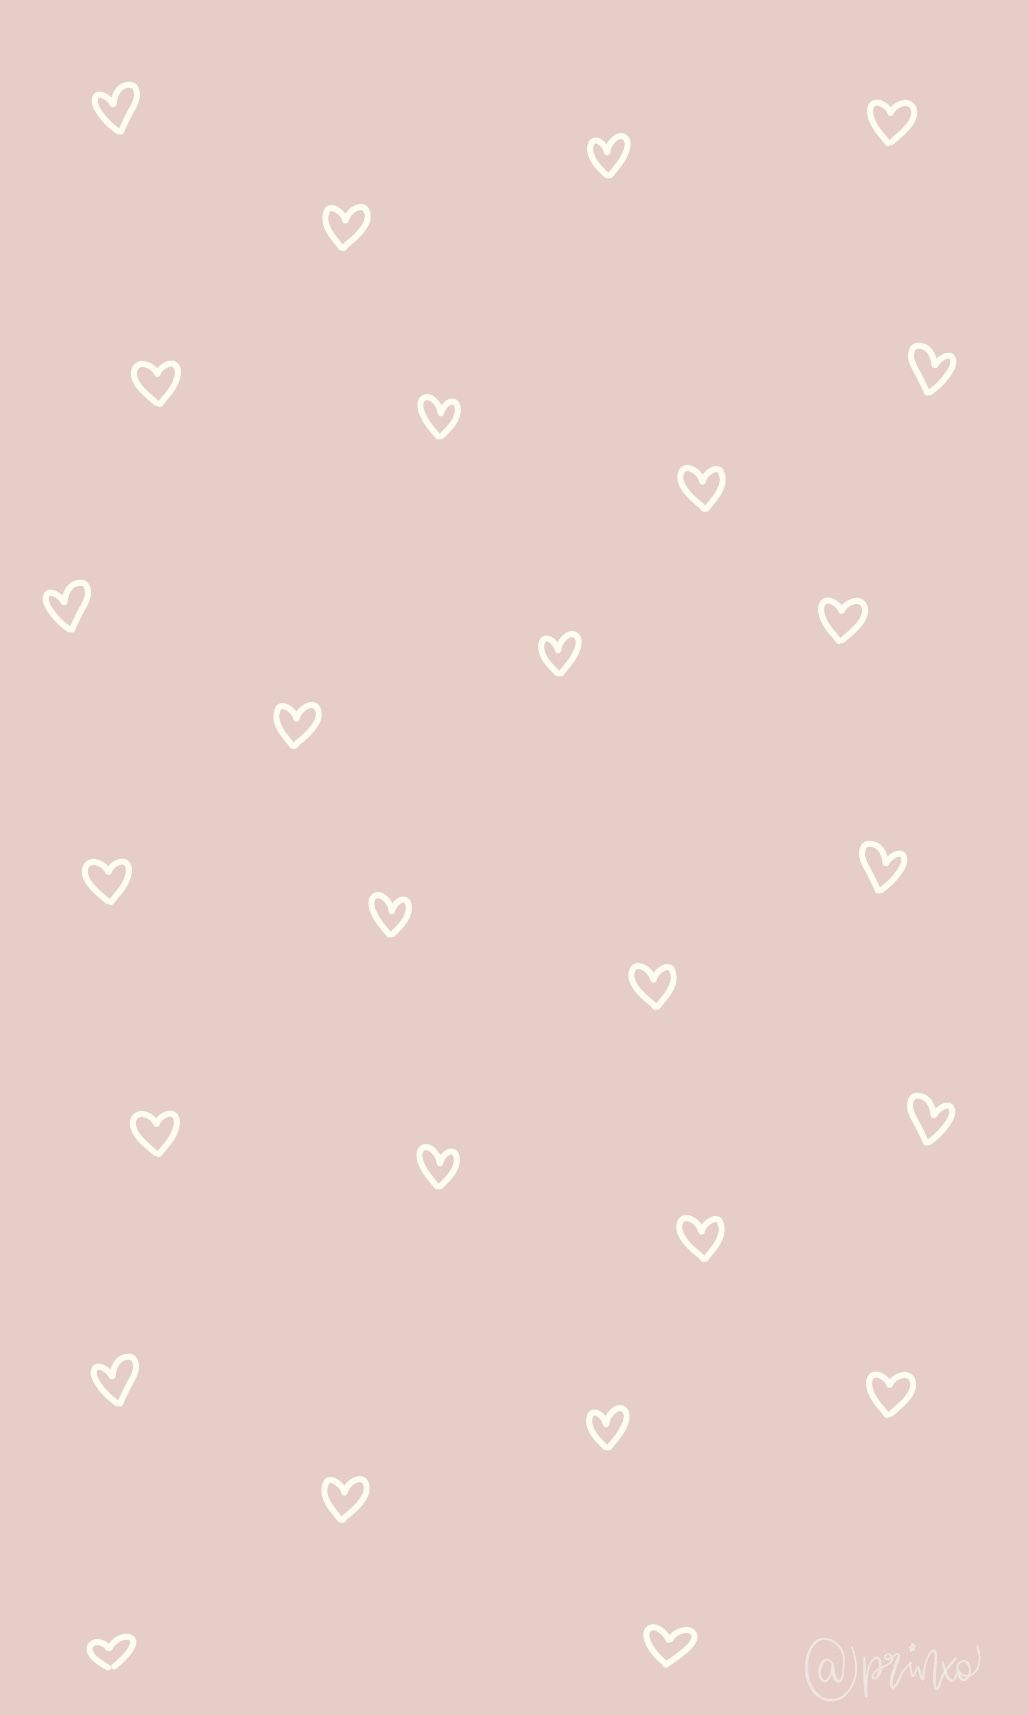 Hearts Wallpaper Rose Gold Gold Wallpaper Iphone Rose Gold Wallpaper Iphone Gold Wallpaper Background